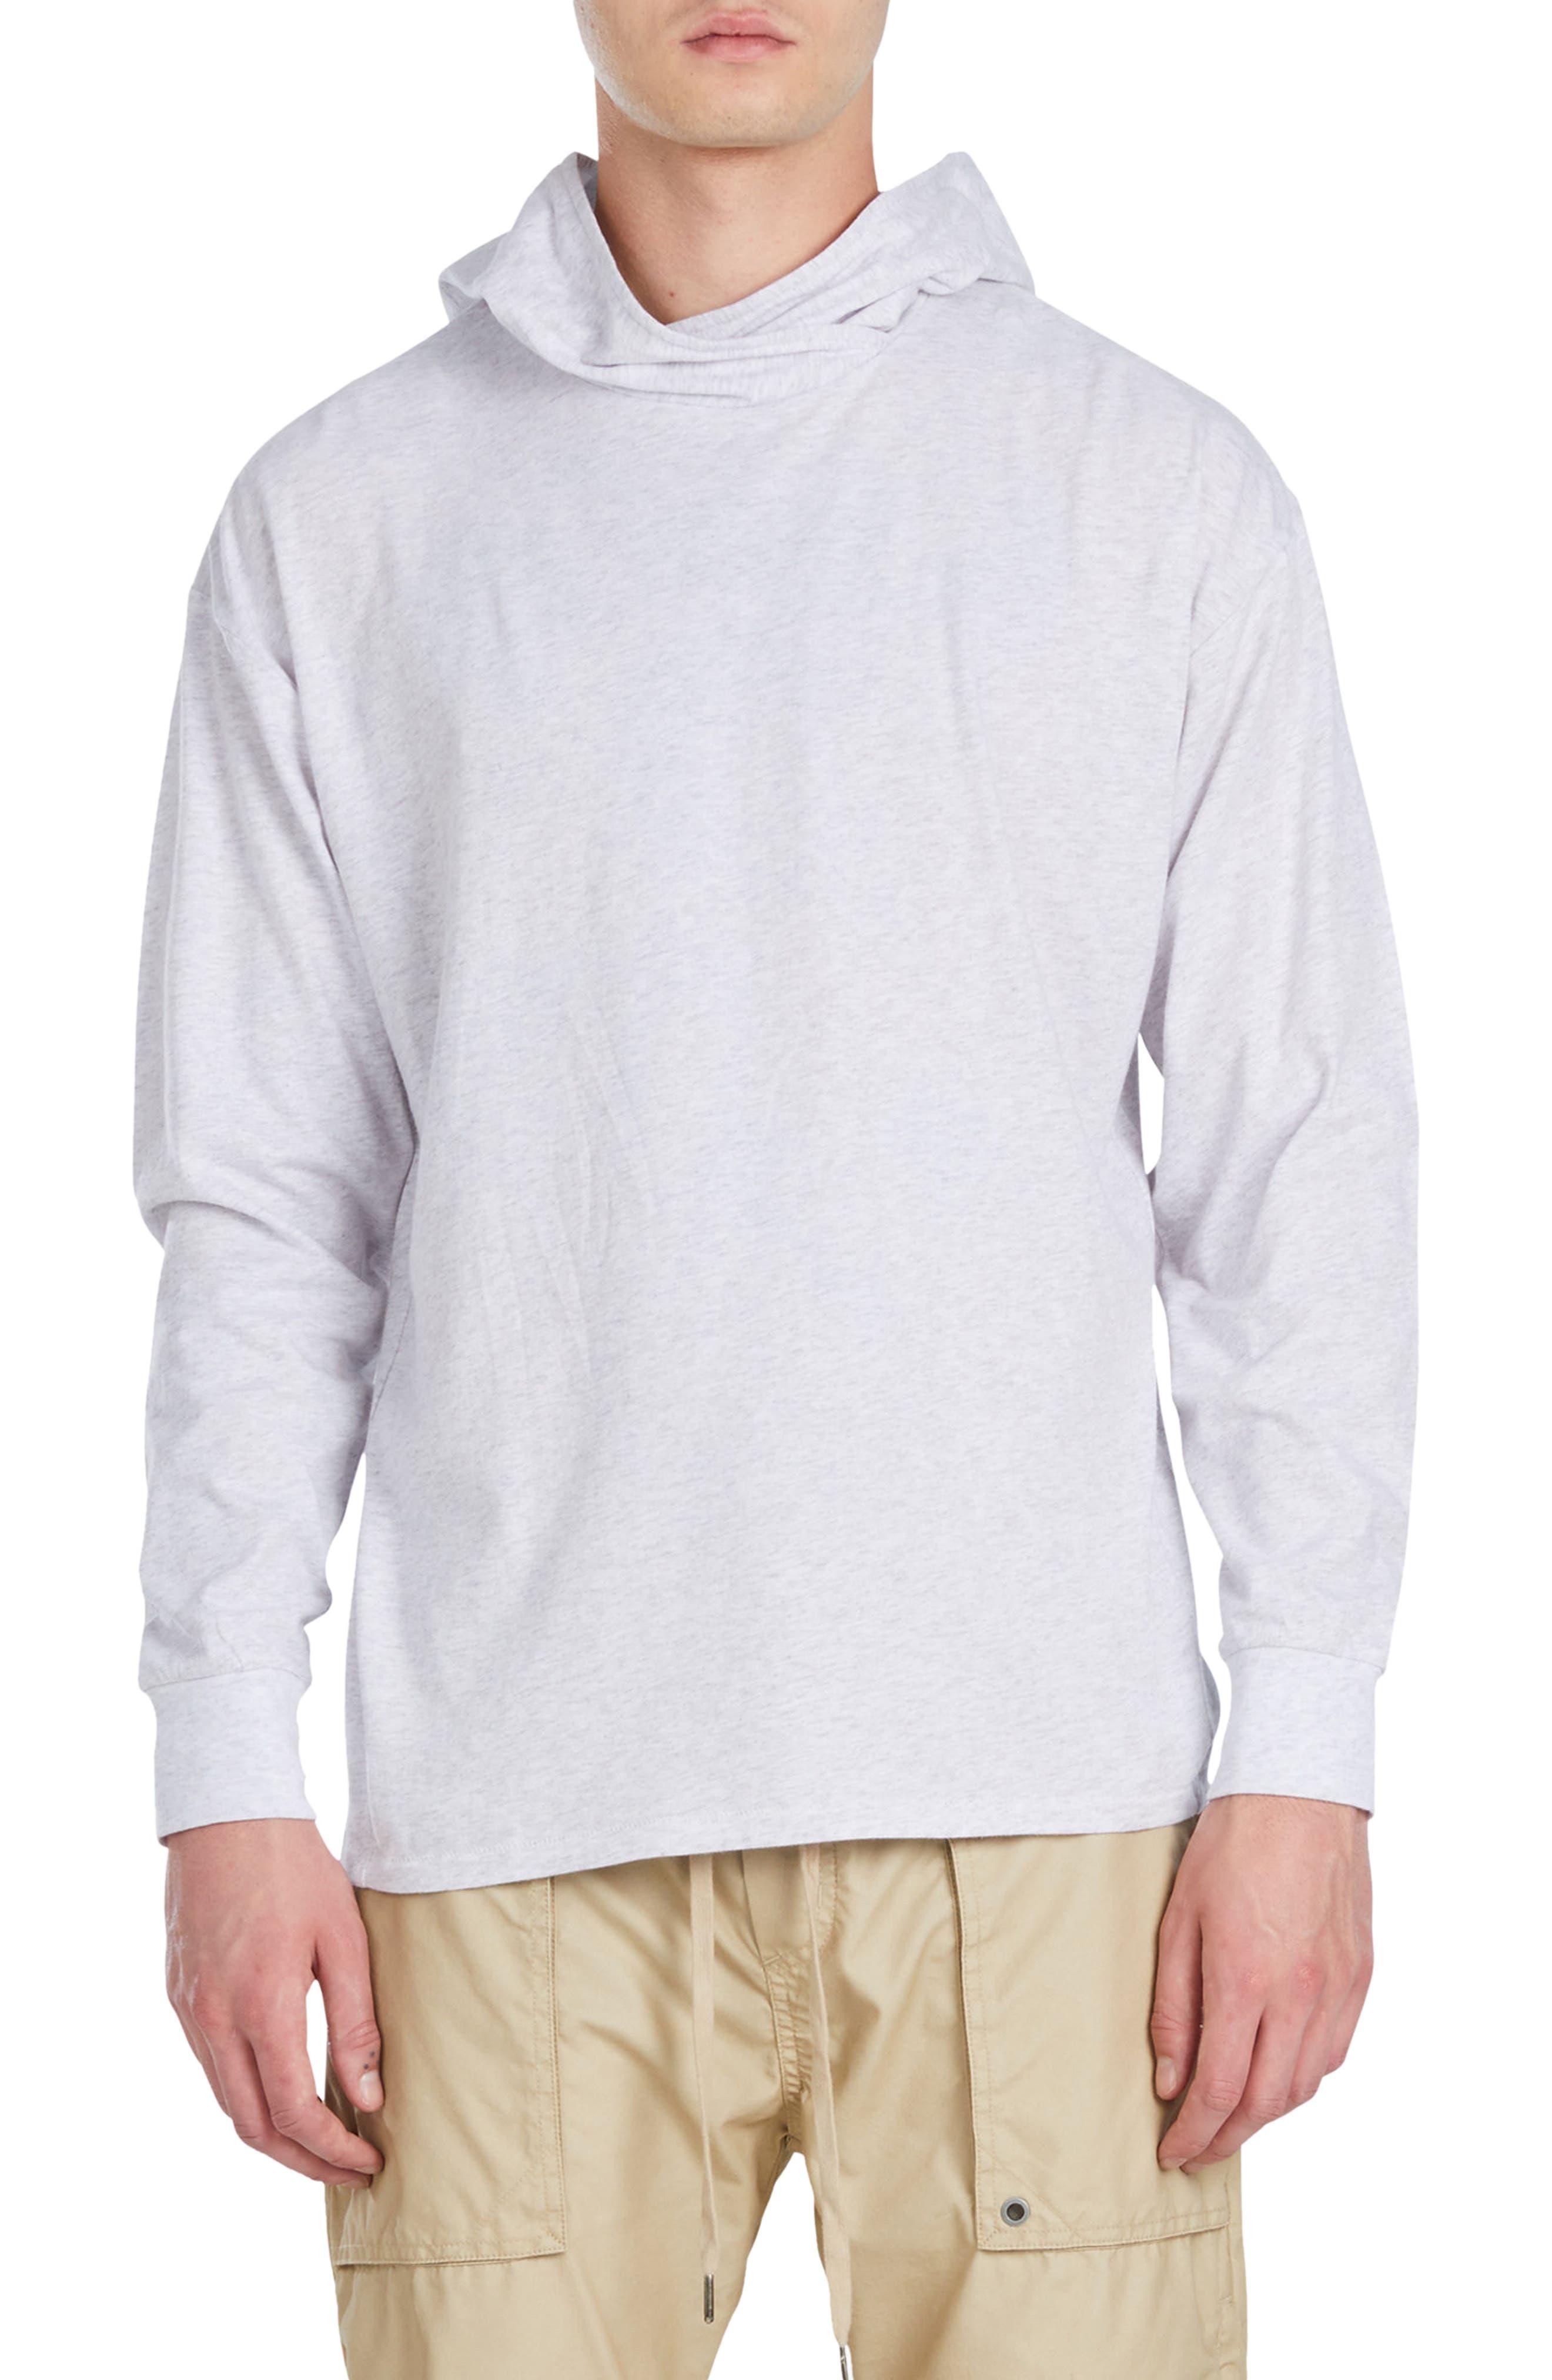 Rugger Long Sleeve Hooded T-Shirt,                             Main thumbnail 1, color,                             Bleach Marled